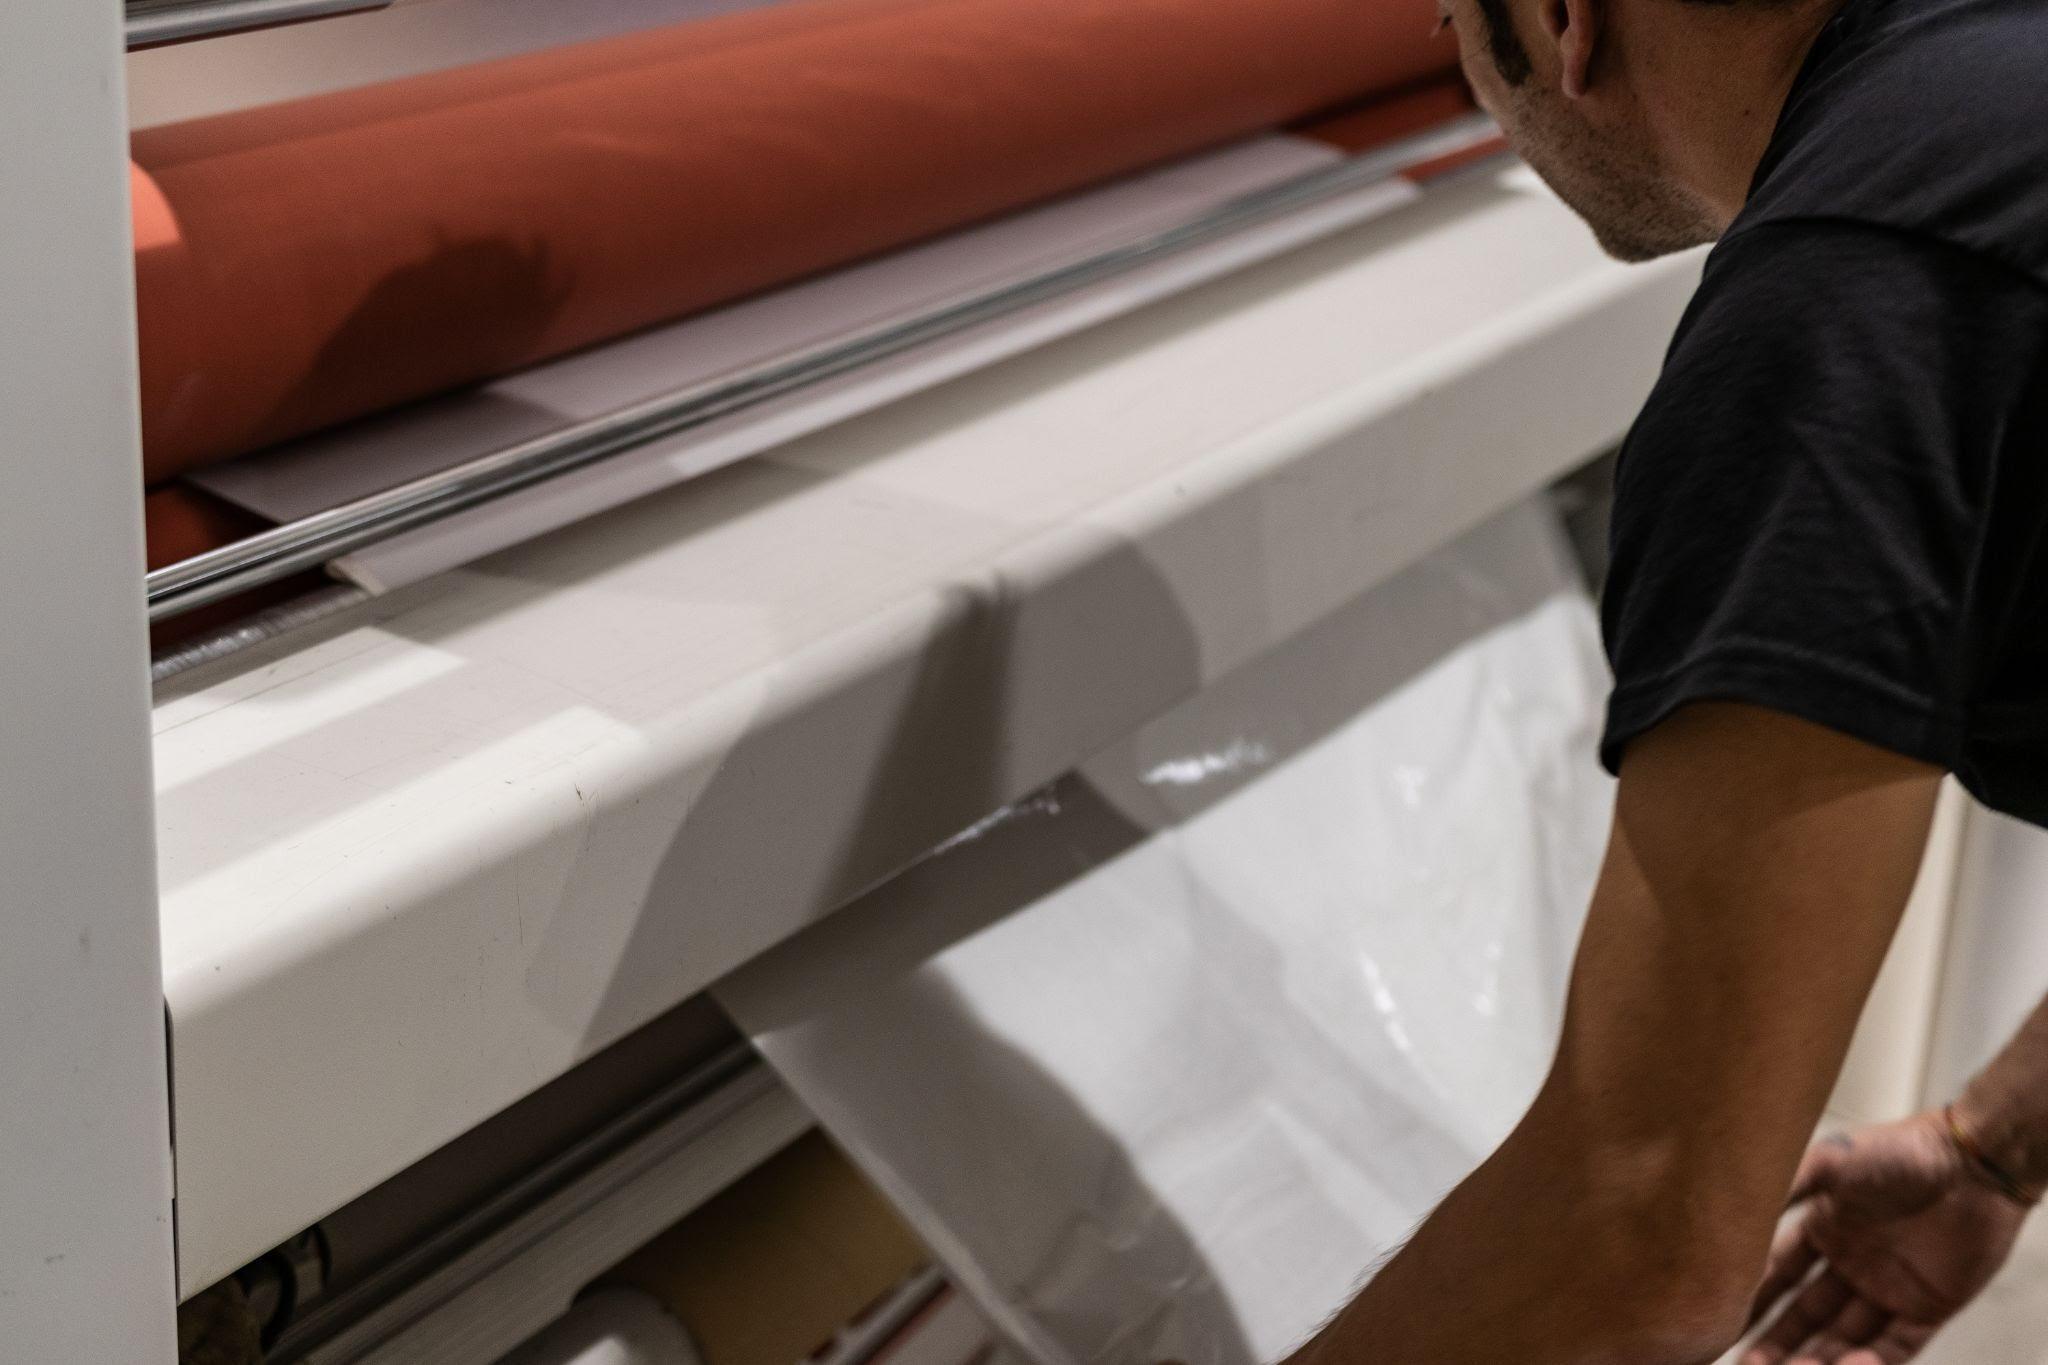 LA-160W heat-assisted laminator